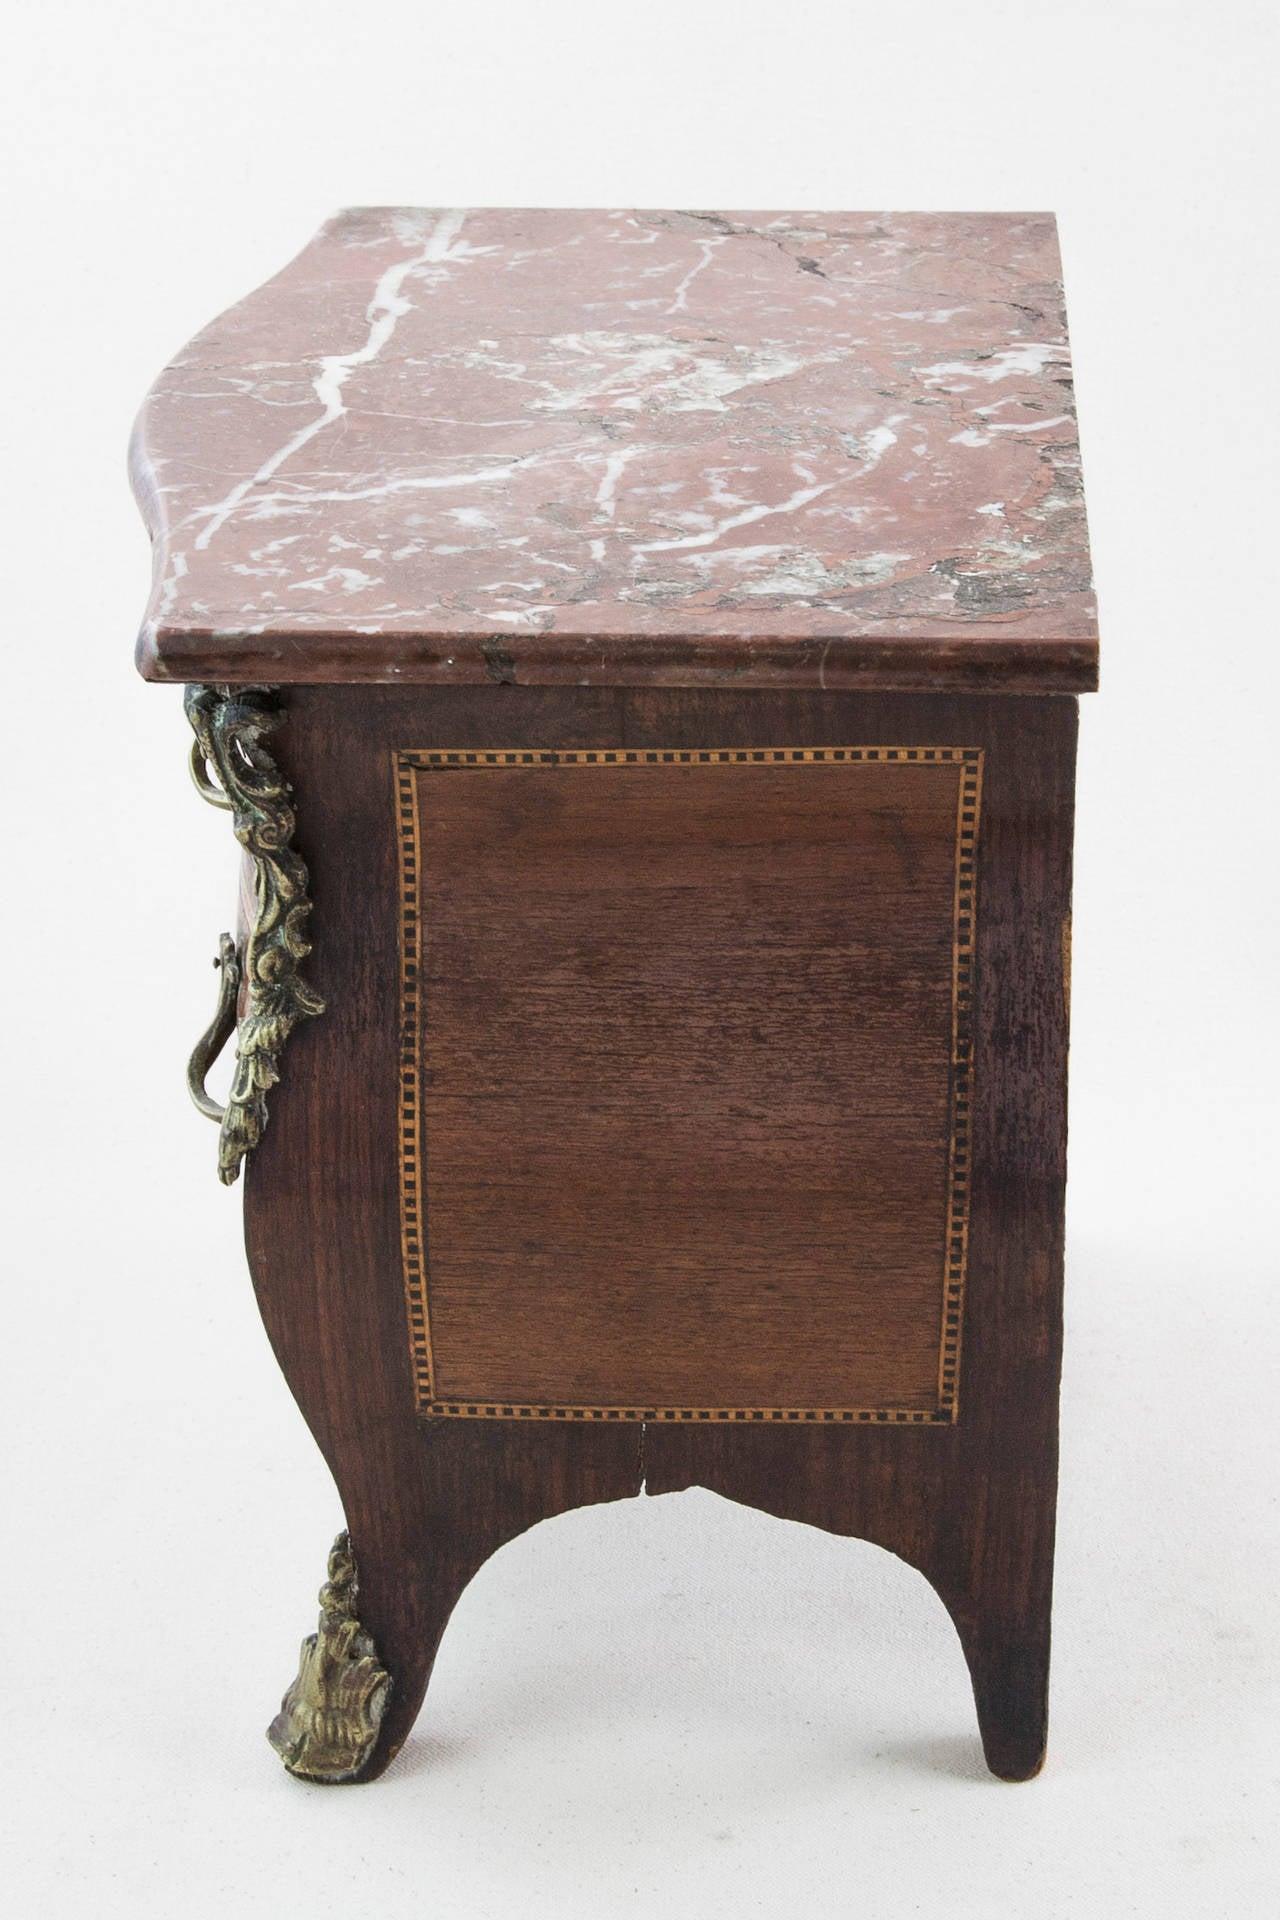 Louis xv style miniature chest jewelry box or meuble de - Meuble louis xv ...